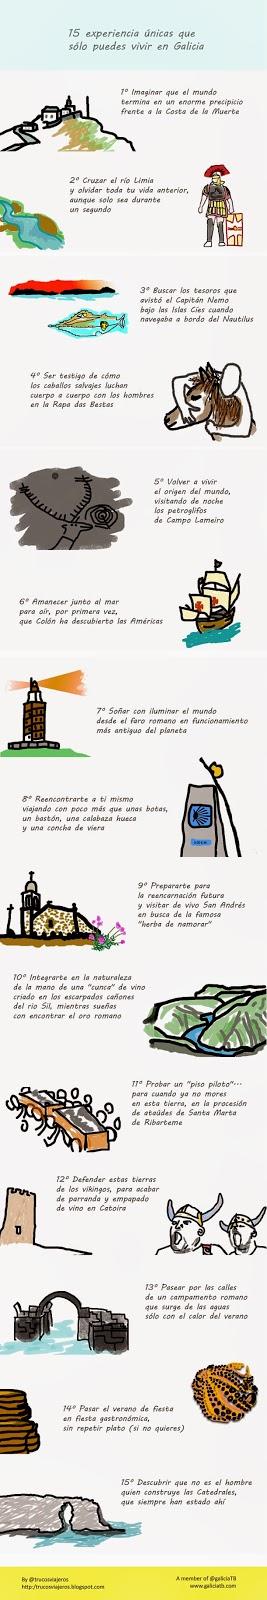 infografía 15 experiencias unicas vivir galicia by trucosviajeros